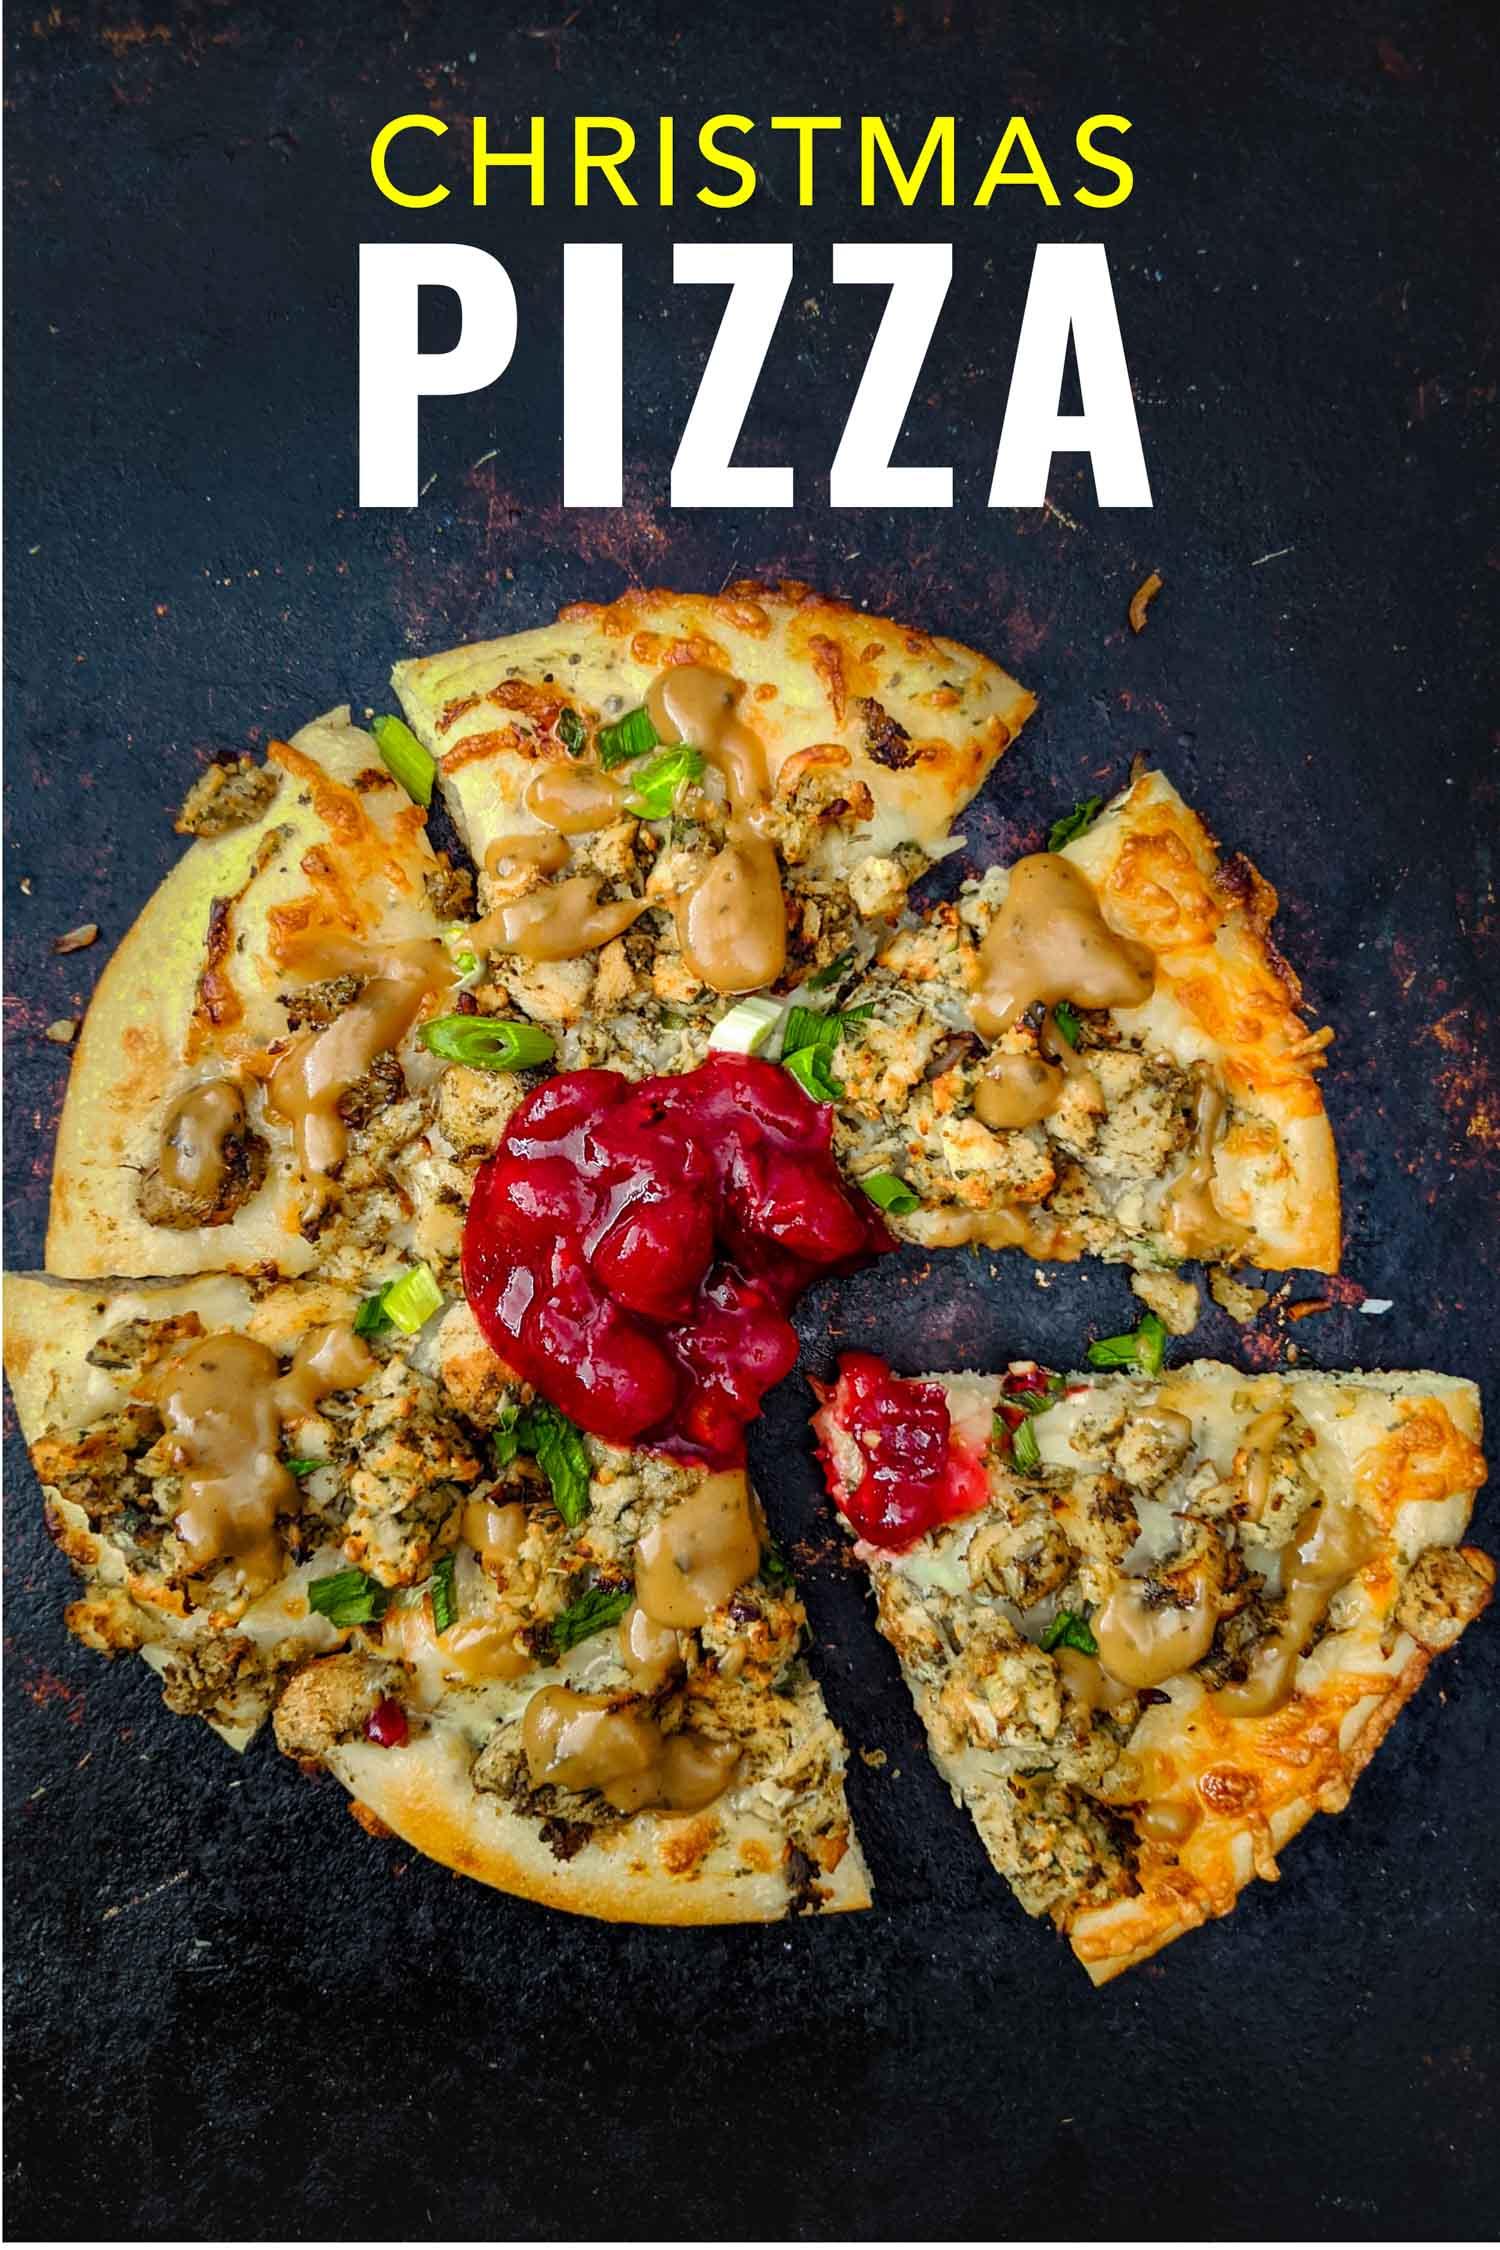 Christmas pizza or thanksgiving pizza using turkey dinner leftovers on black.